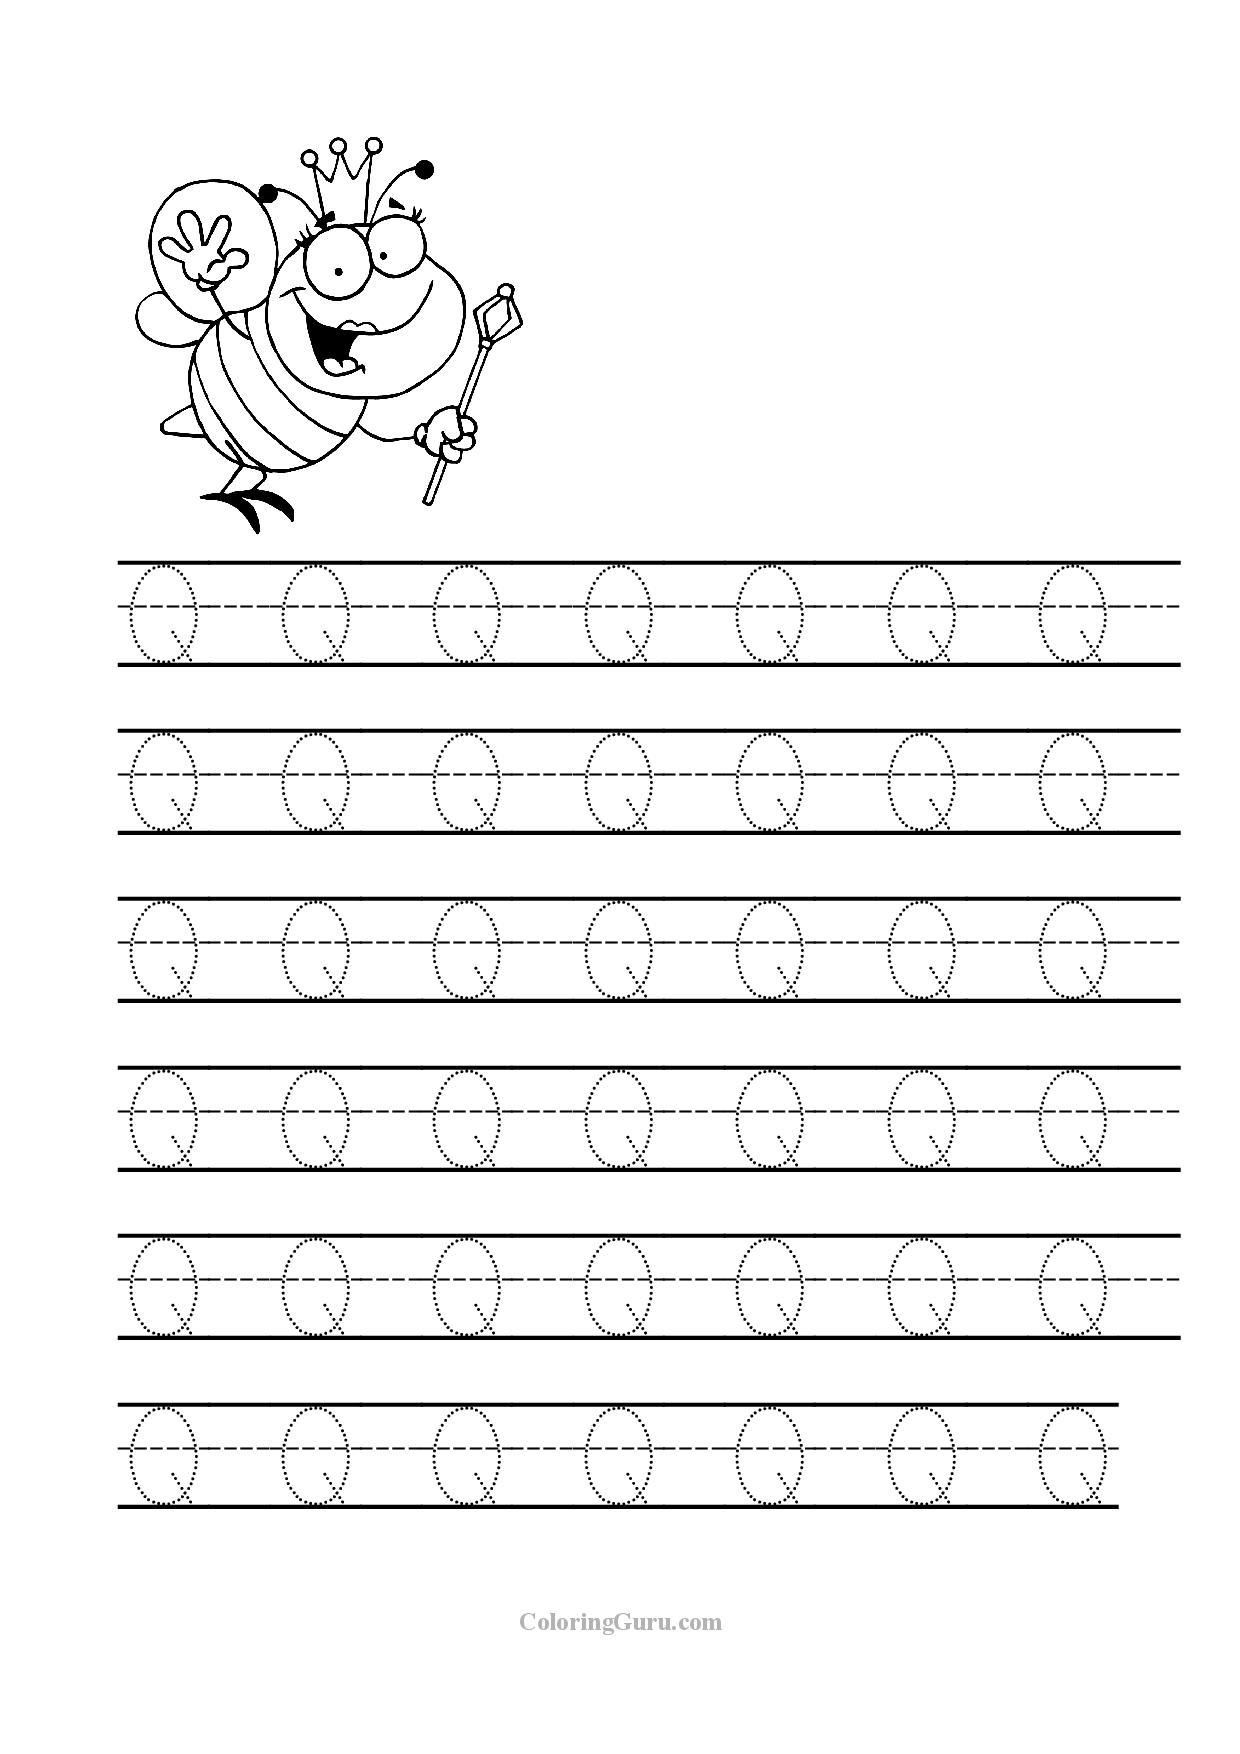 2 Tracing Letter O Worksheets Practice Free Printable Tracing Letter Q Worksheets For Prescho In 2020 Letter Q Worksheets Letter O Worksheets Learning Worksheets